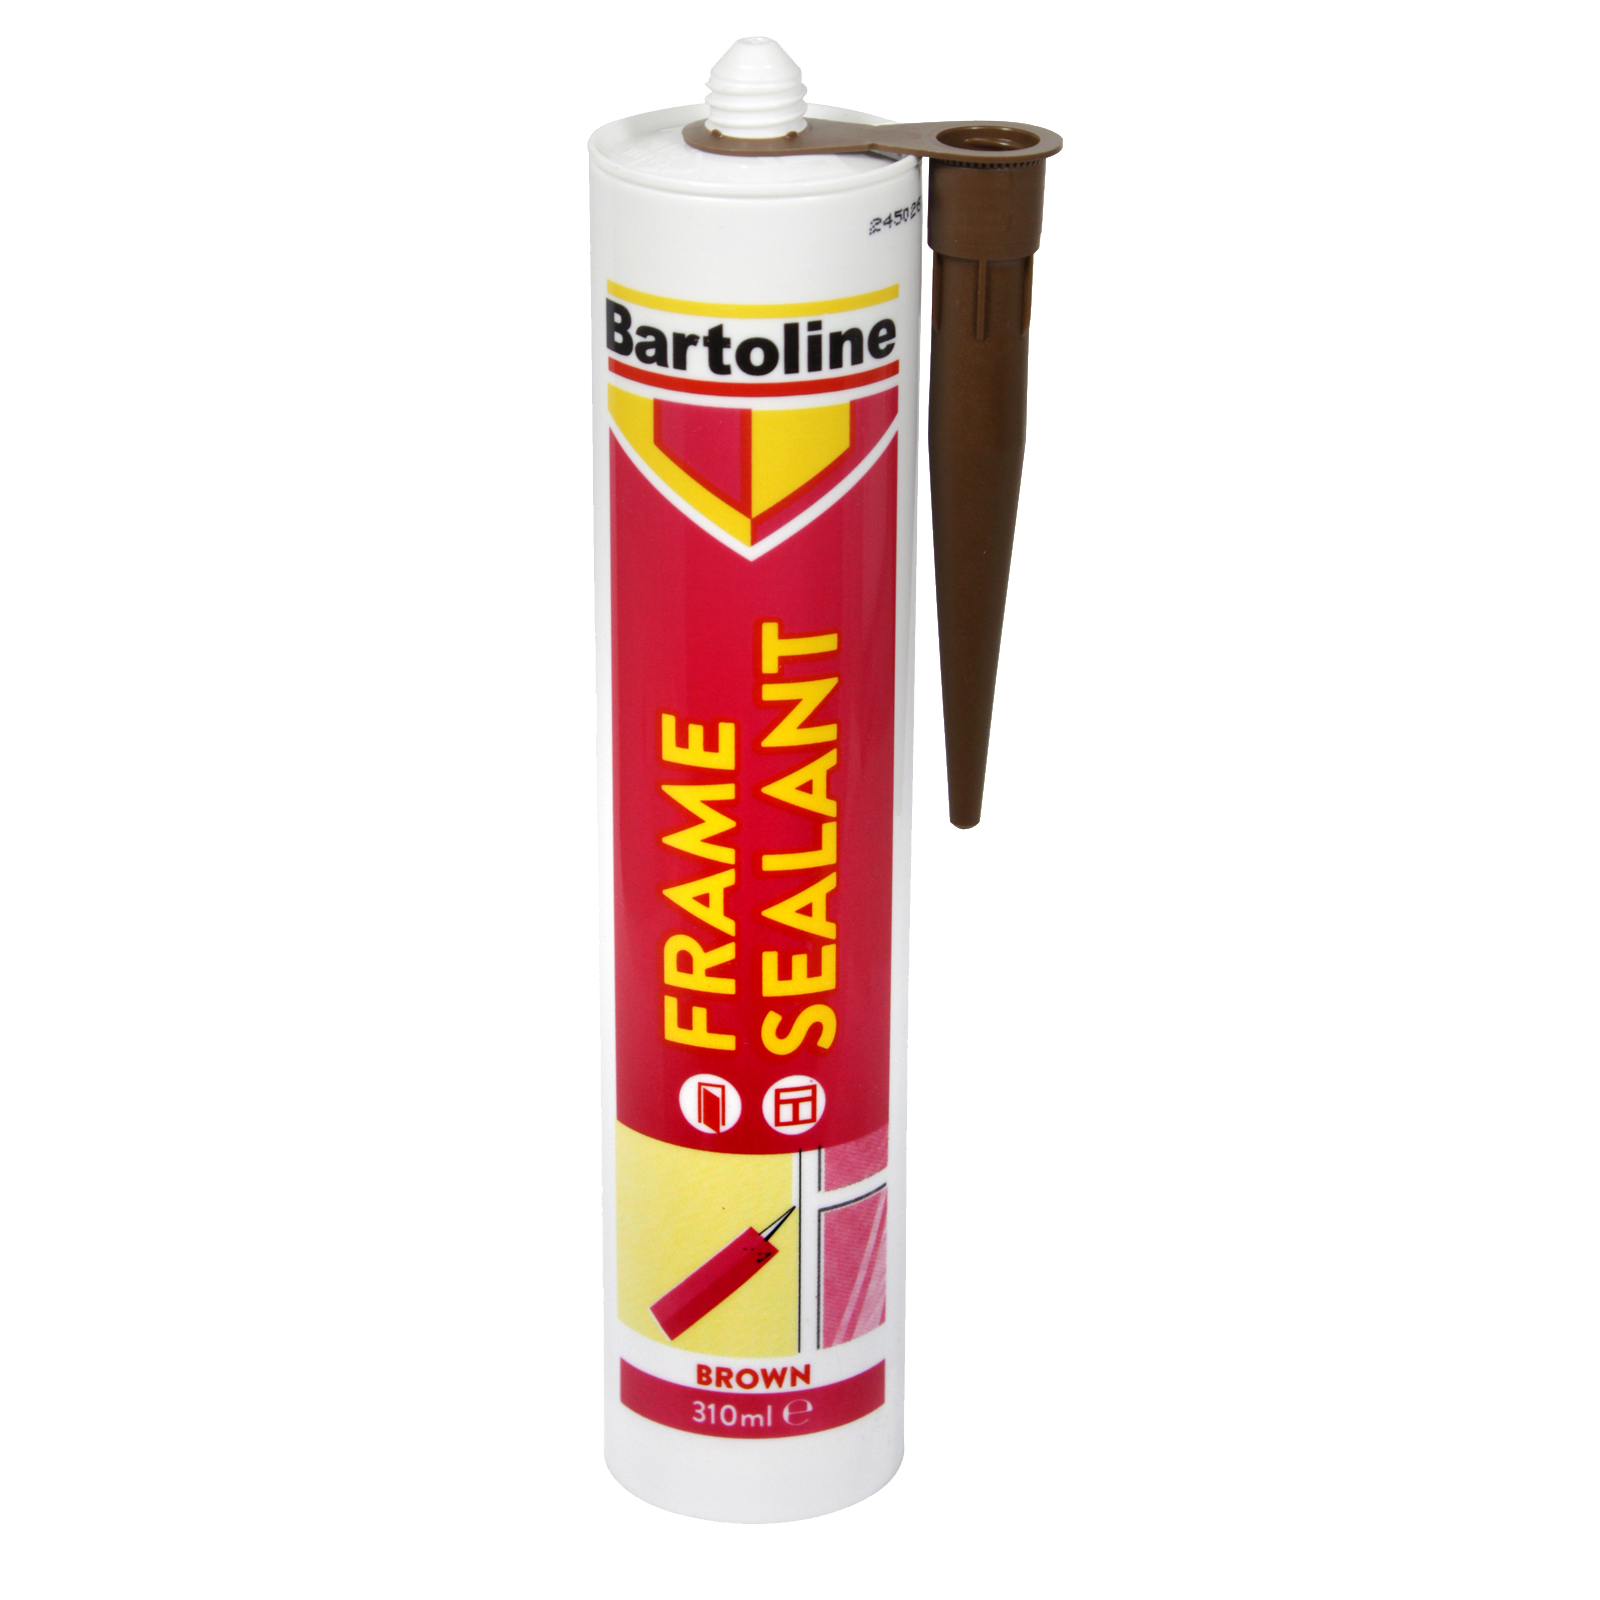 BARTOLINE FRAME SEALANT 310ML CARTRIDGE BROWN